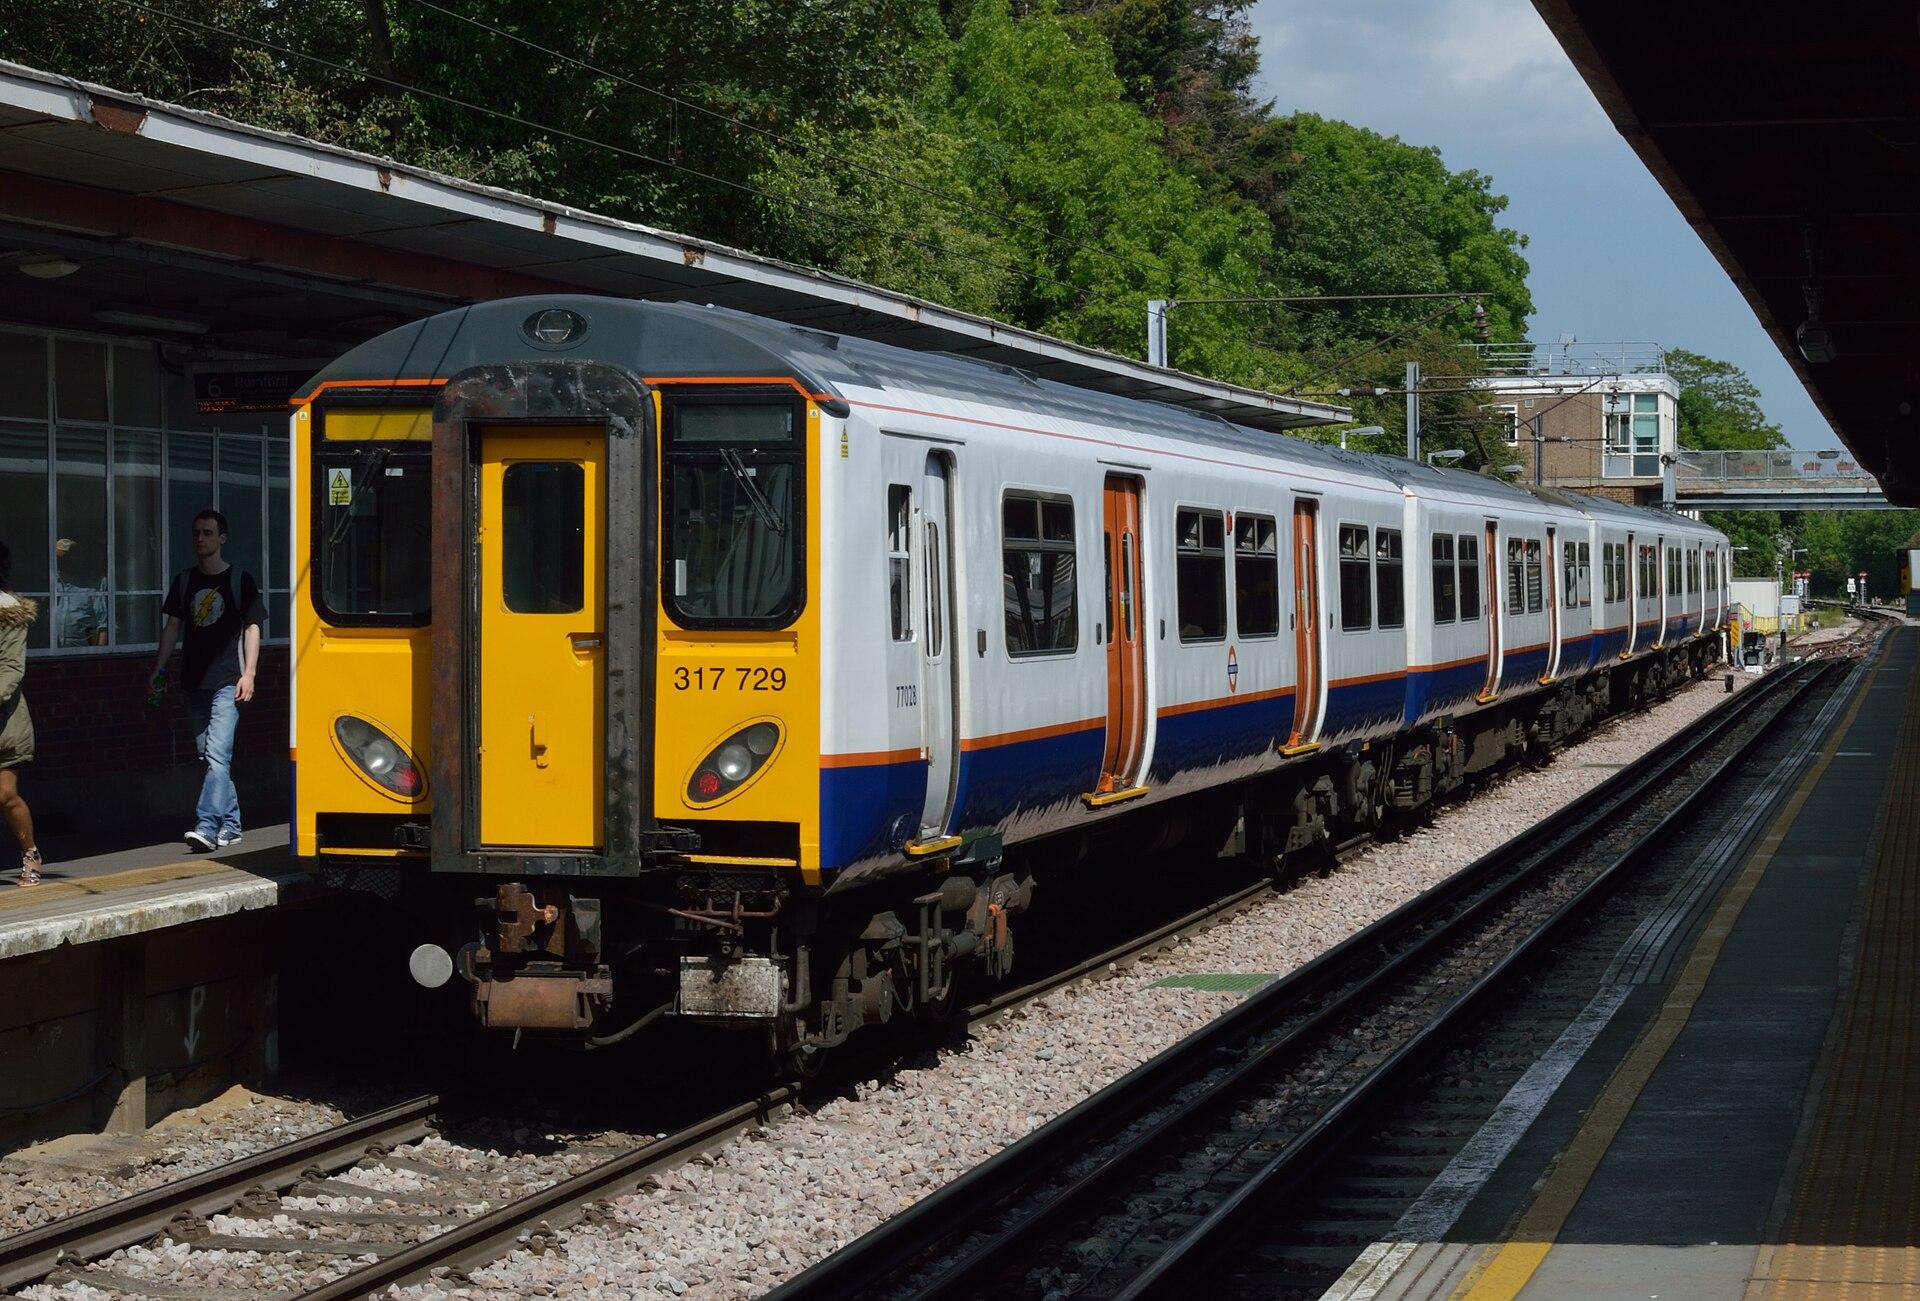 British Rail Class 317 Wikipedia